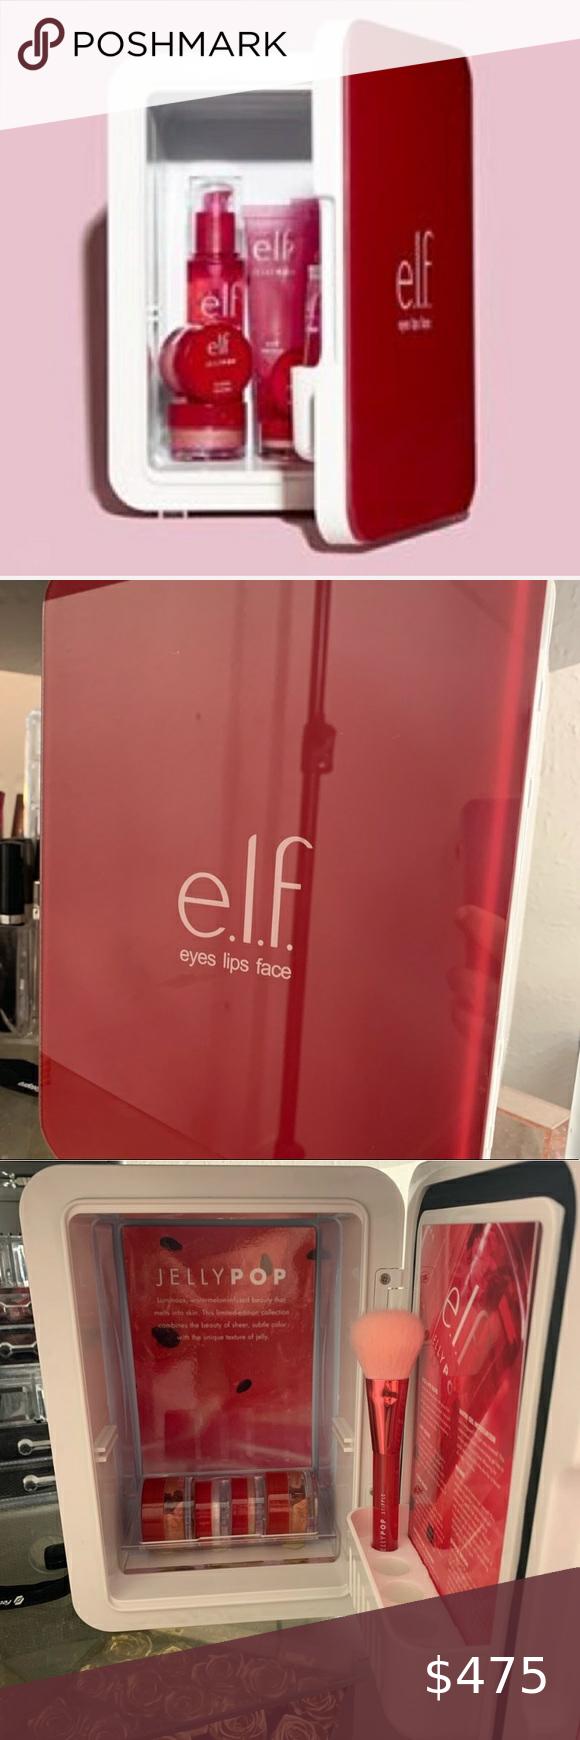 Elf Refrigerator JELLY POP PR in 2020 Elf cosmetics